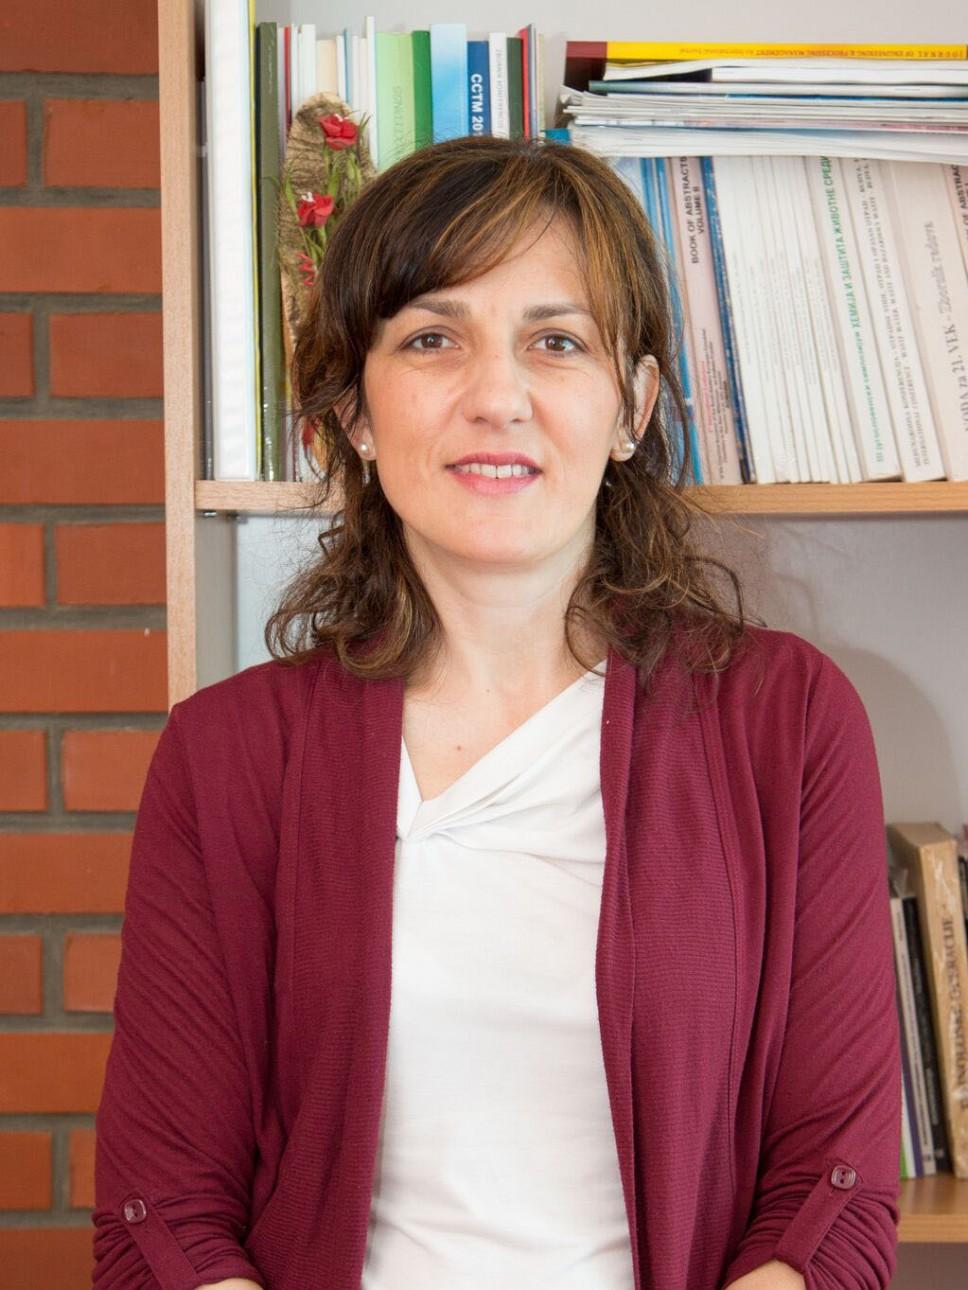 Biografija - Tadić Milena